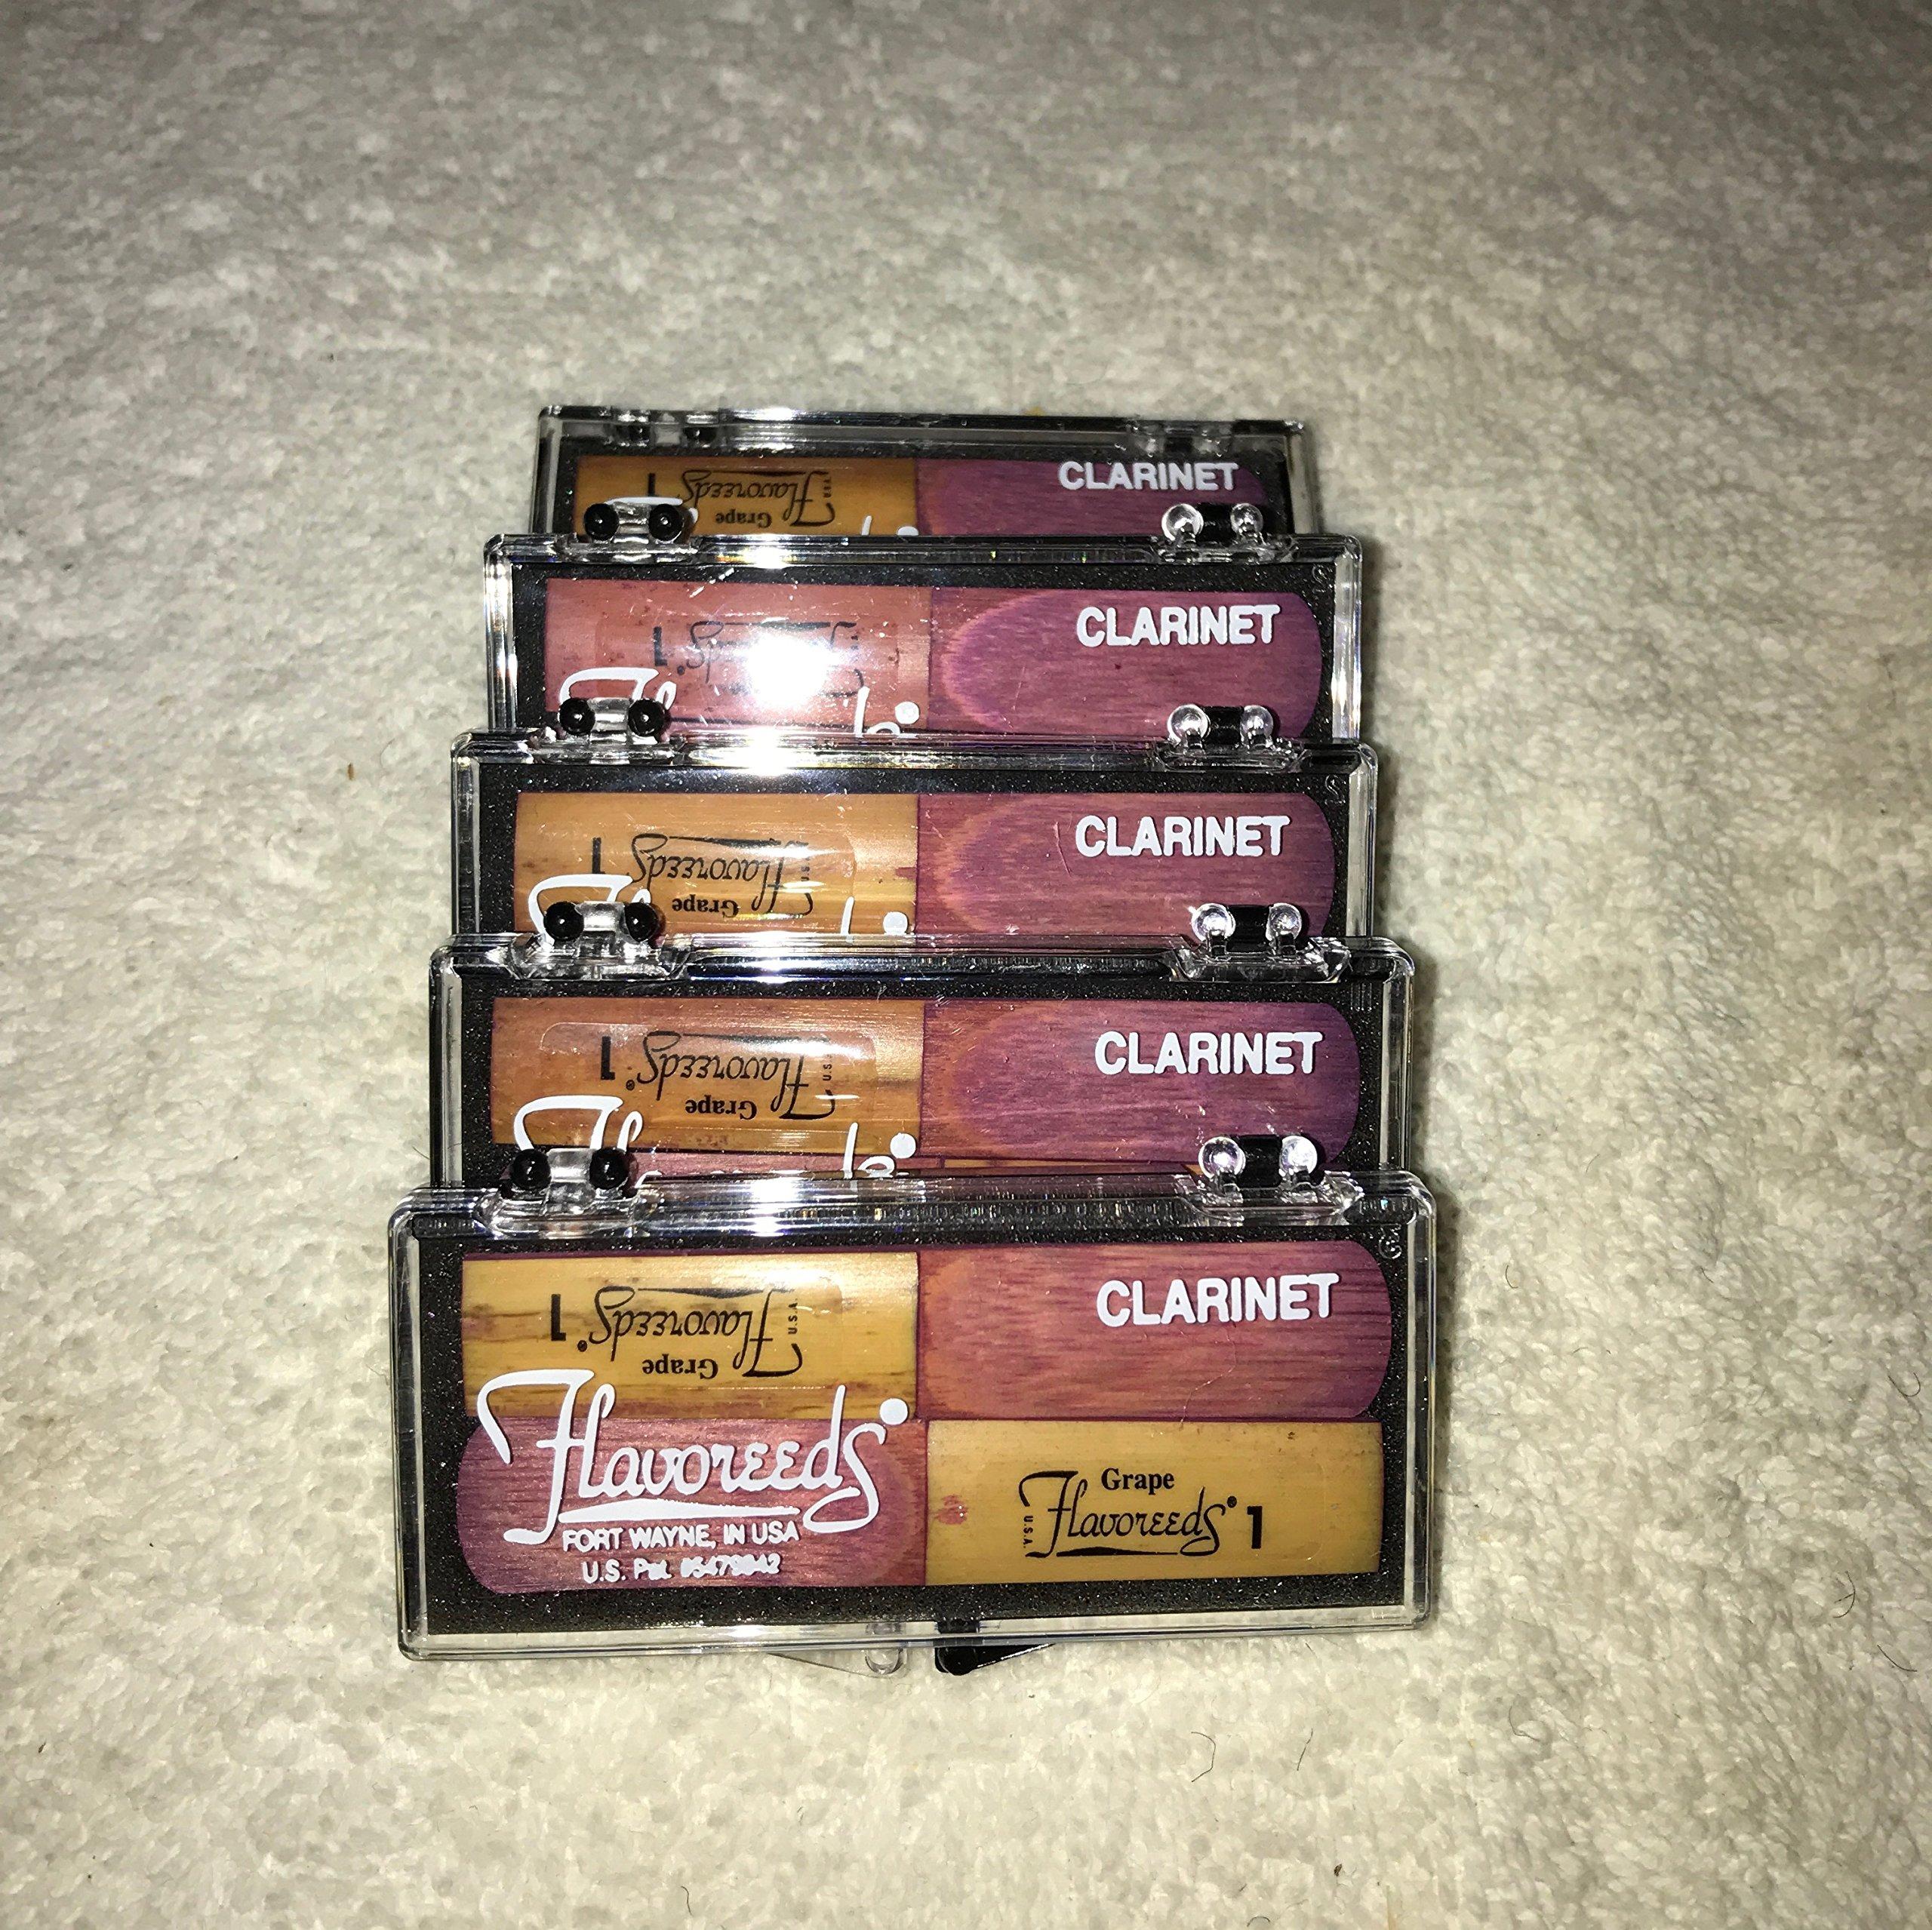 Flavoreeds - #1 Str. Clarinet - Grape - Twinpak(5)